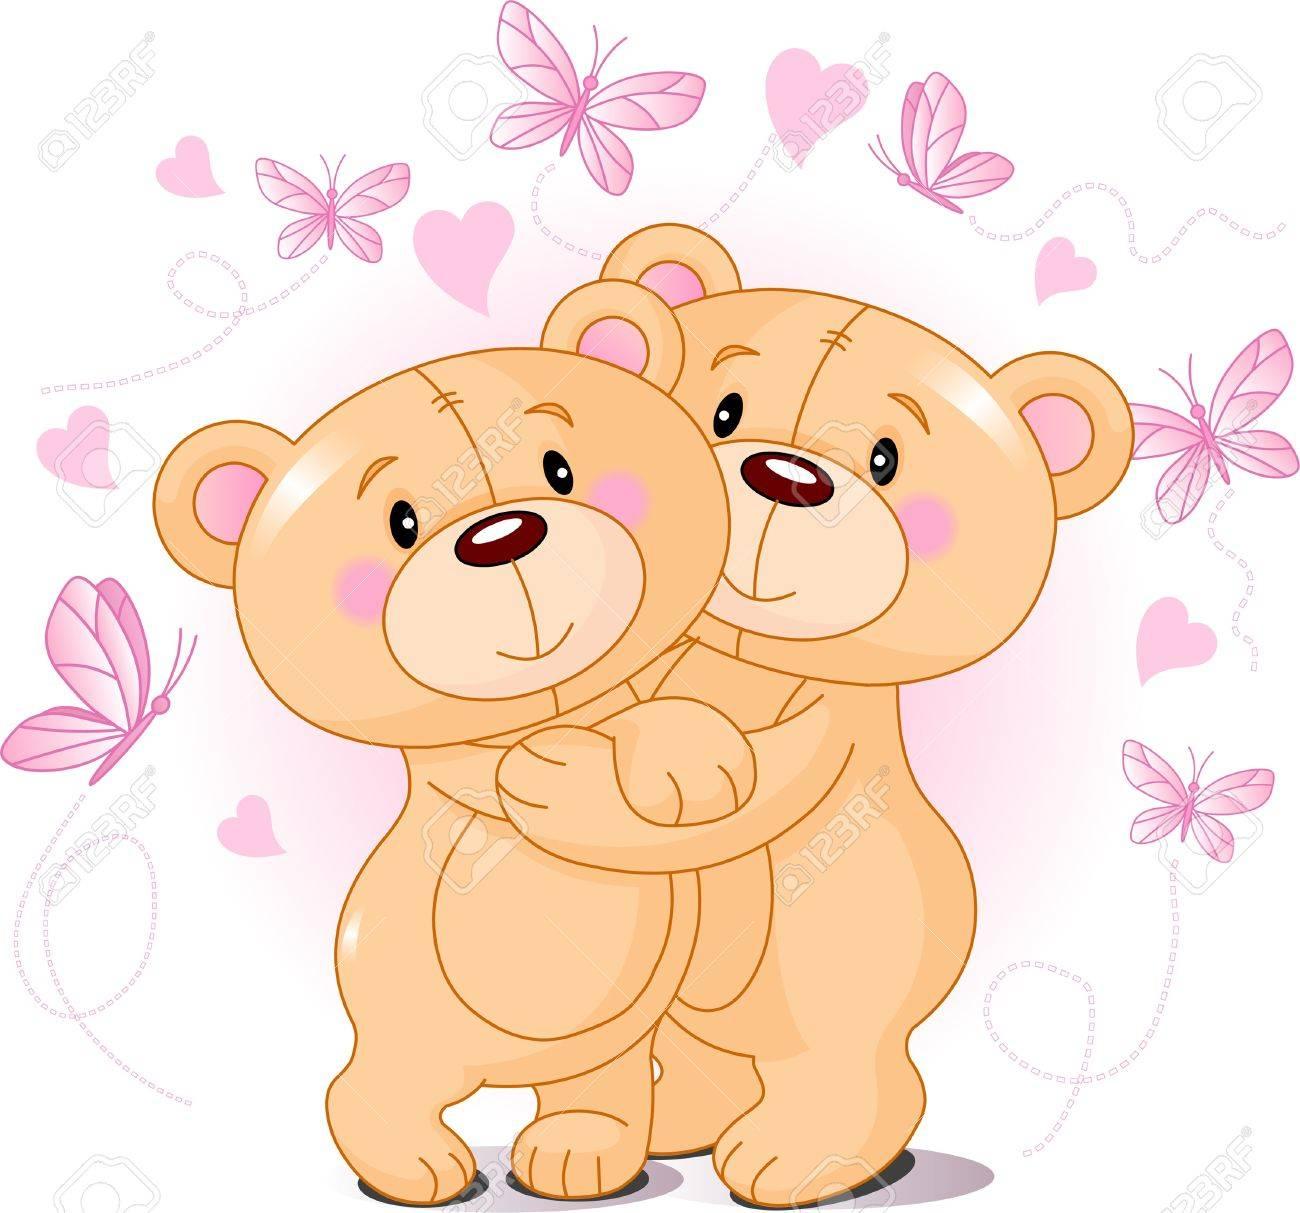 Two cute Teddy bears in love Stock Vector - 8468976